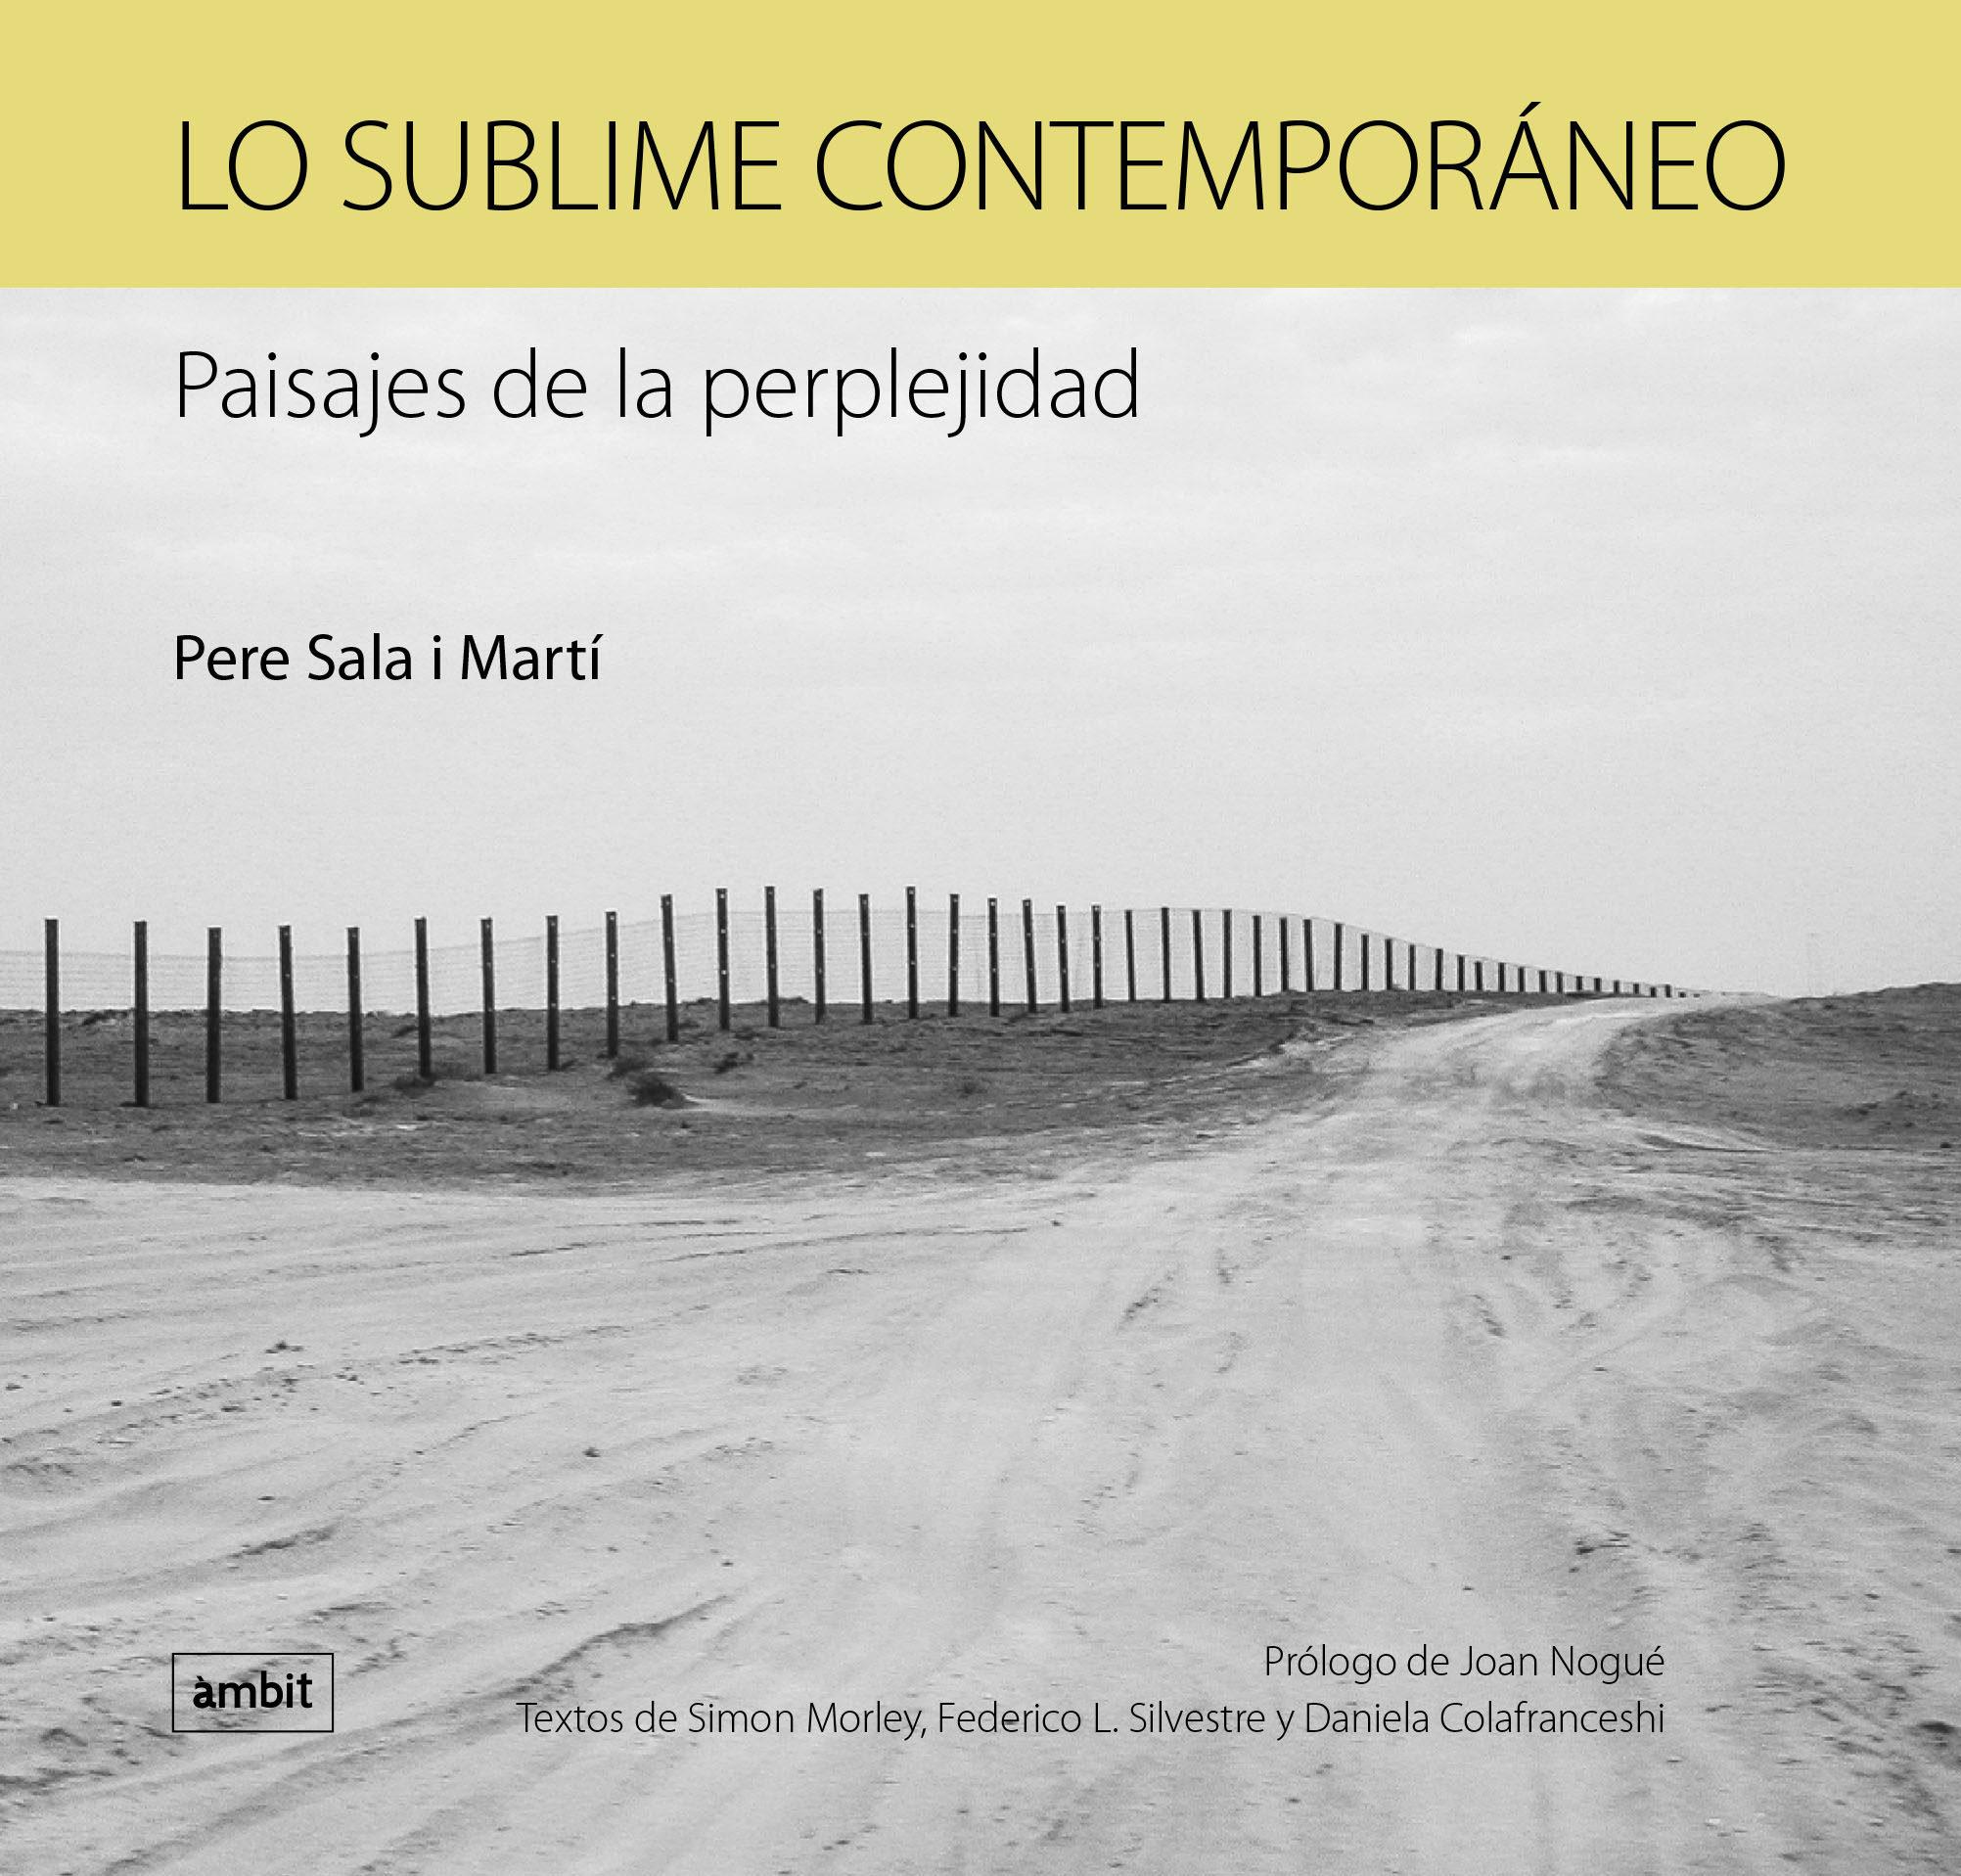 lo sublime contemporaneo: paisajes de la perplejidad-pere sala i marti-9788496645417